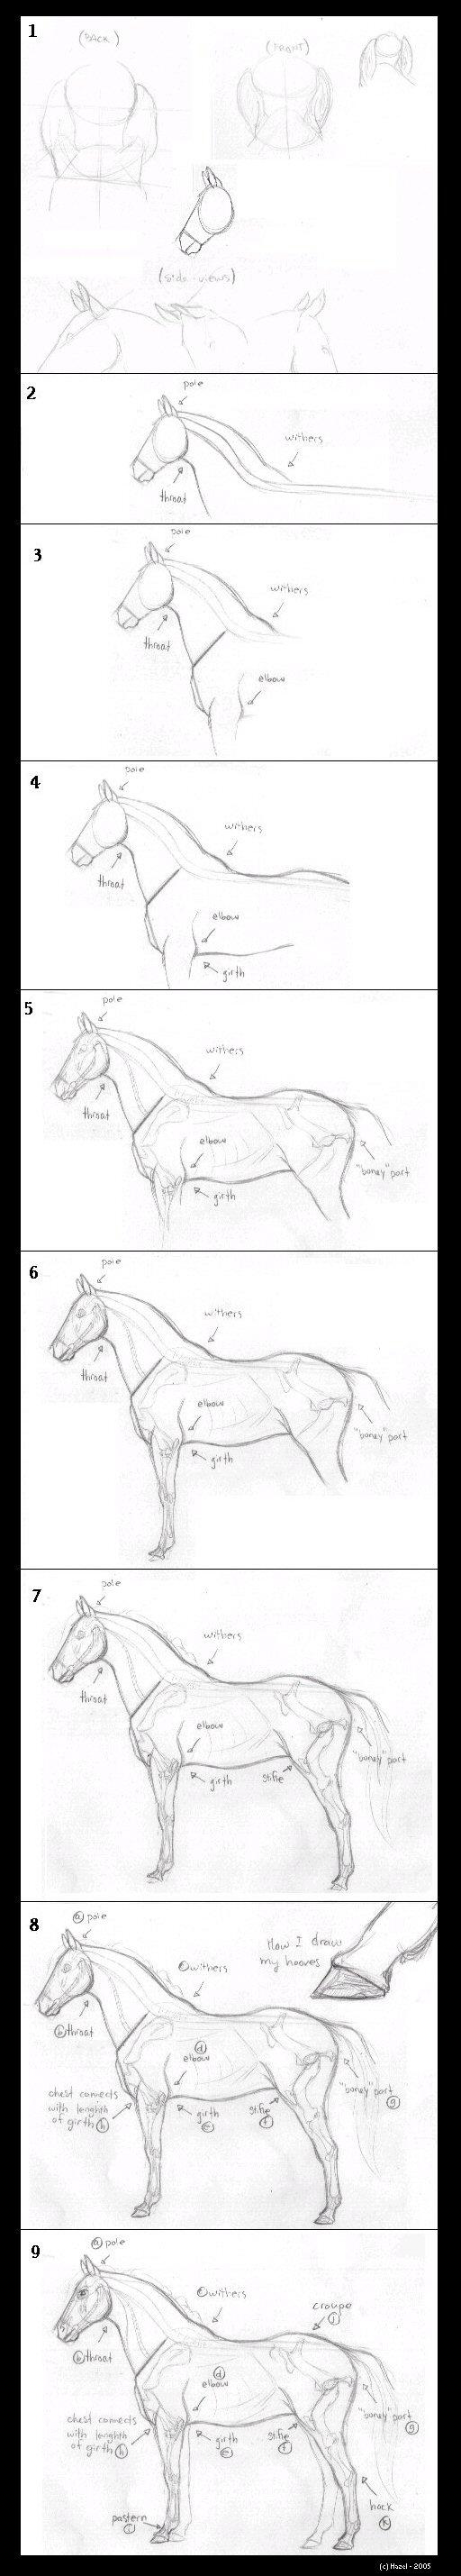 How to Draw Horses by Hazel Rah Tutorial___How_To_Draw_Horses